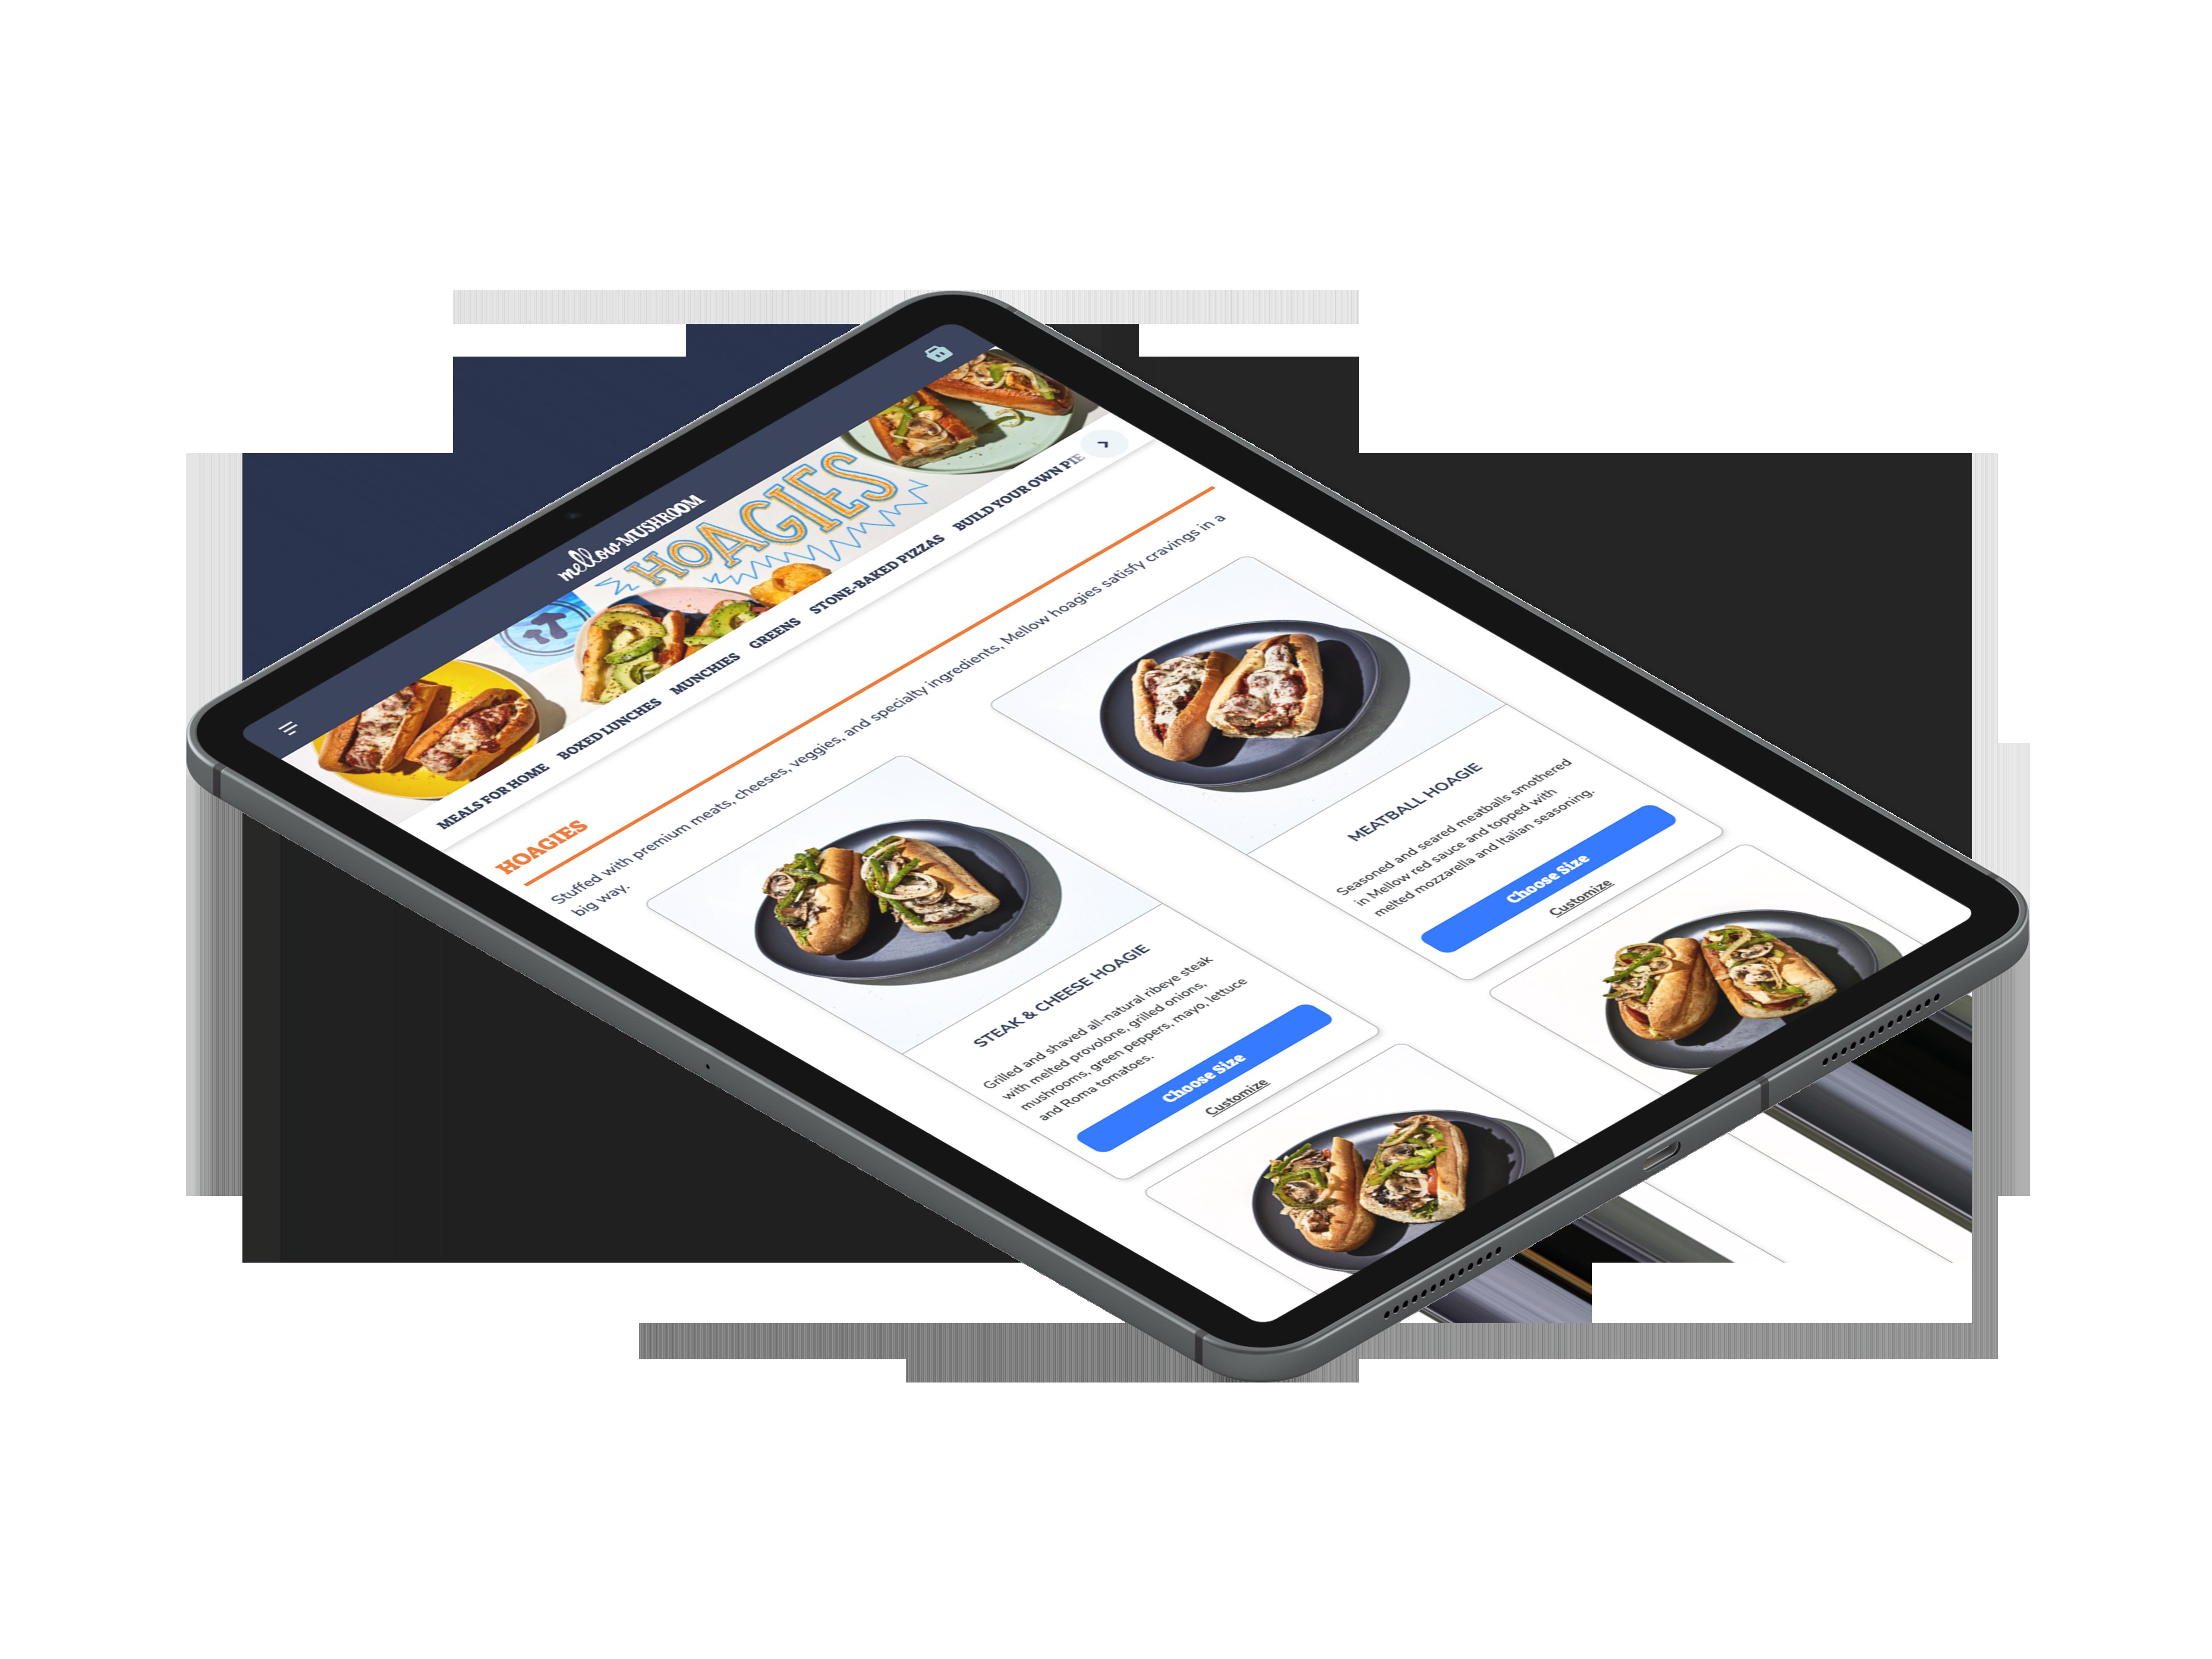 Mellow mushroom online ordering on tablet